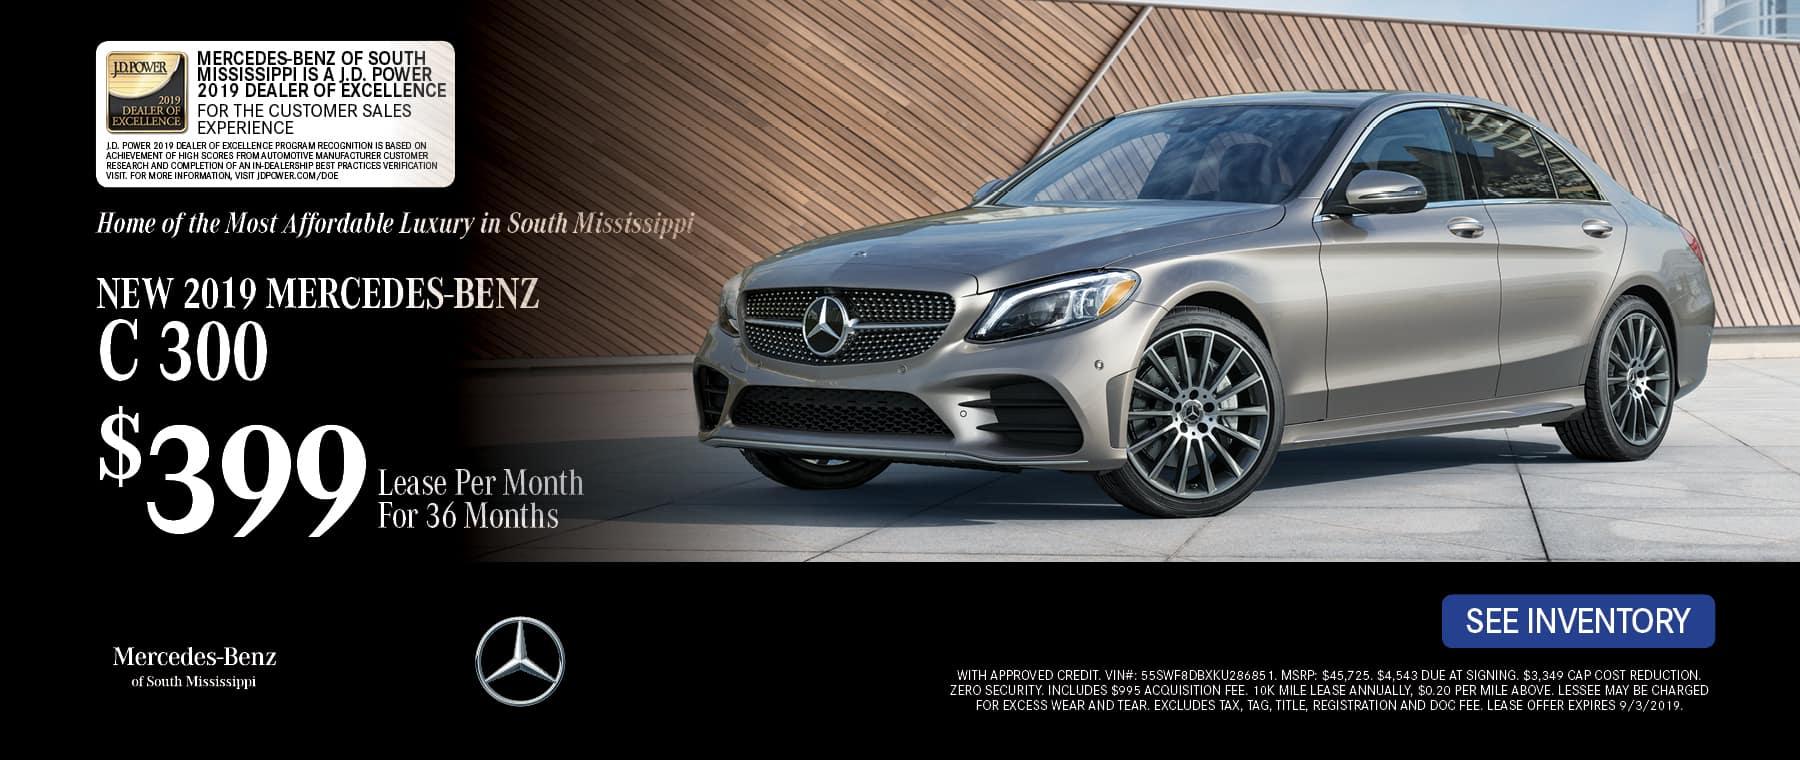 Mercedes Benz Of North Haven Home Facebook >> Mercedes Benz Of South Mississippi Mercedes Benz Dealer In D